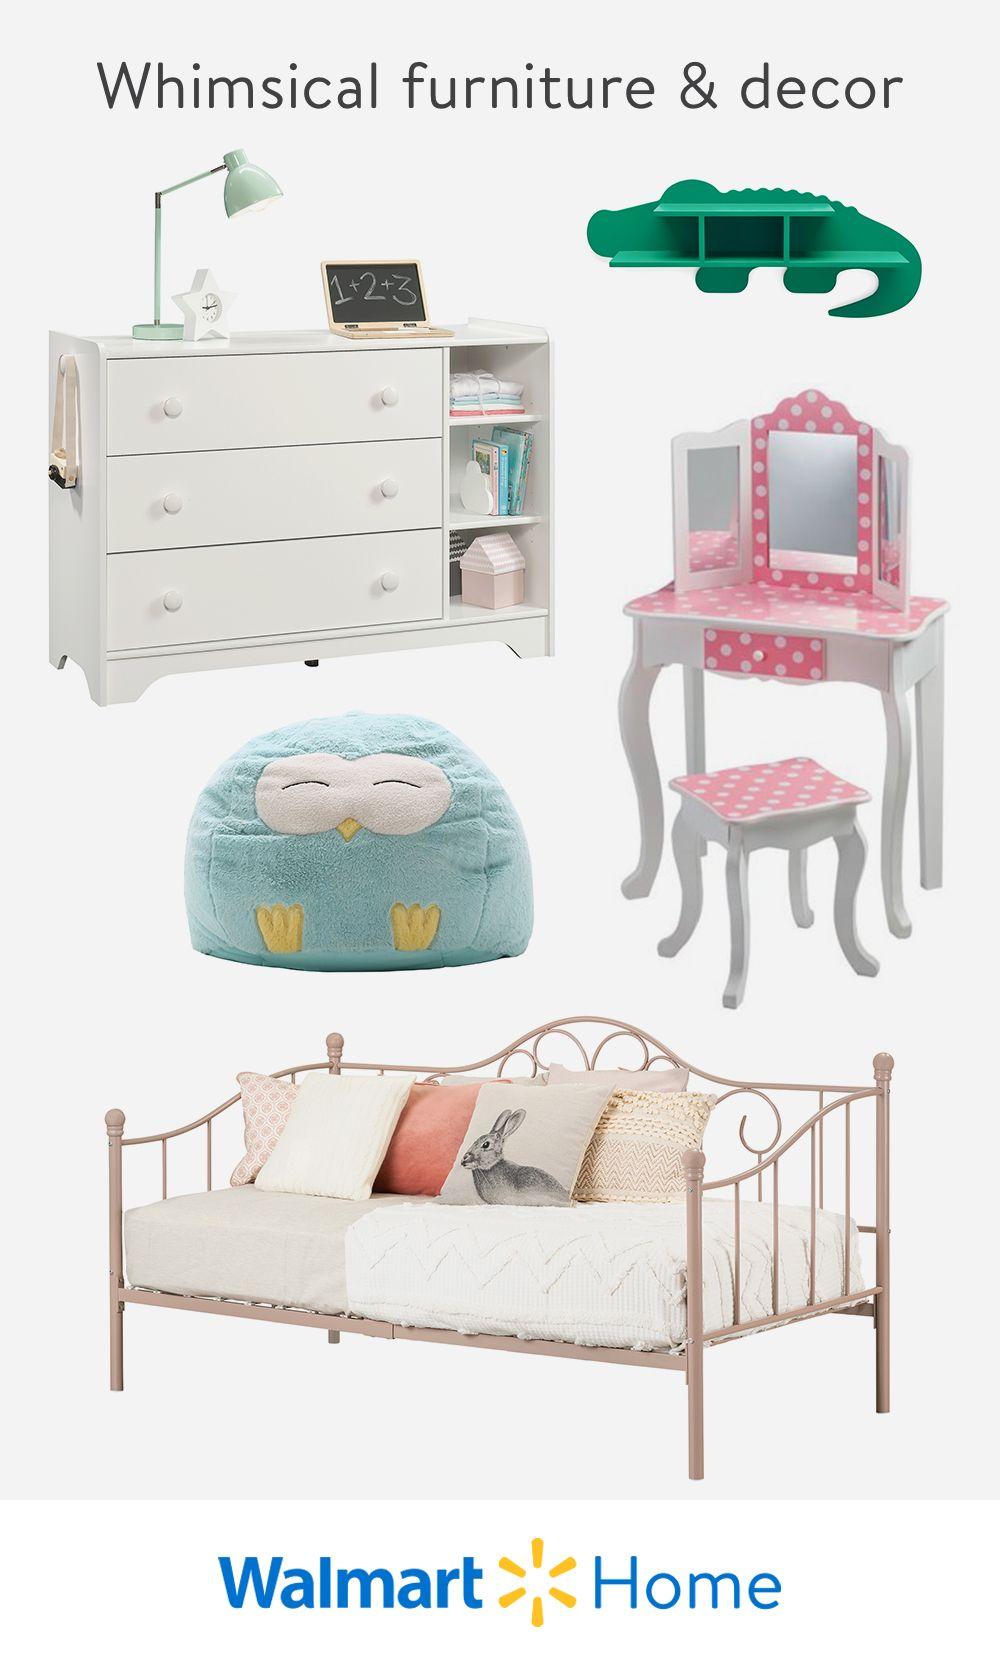 Pin By Lionezzpreenzezz On For The Girls Kids Bedroom Decor Girl Bedroom Decor Room Ideas Bedroom